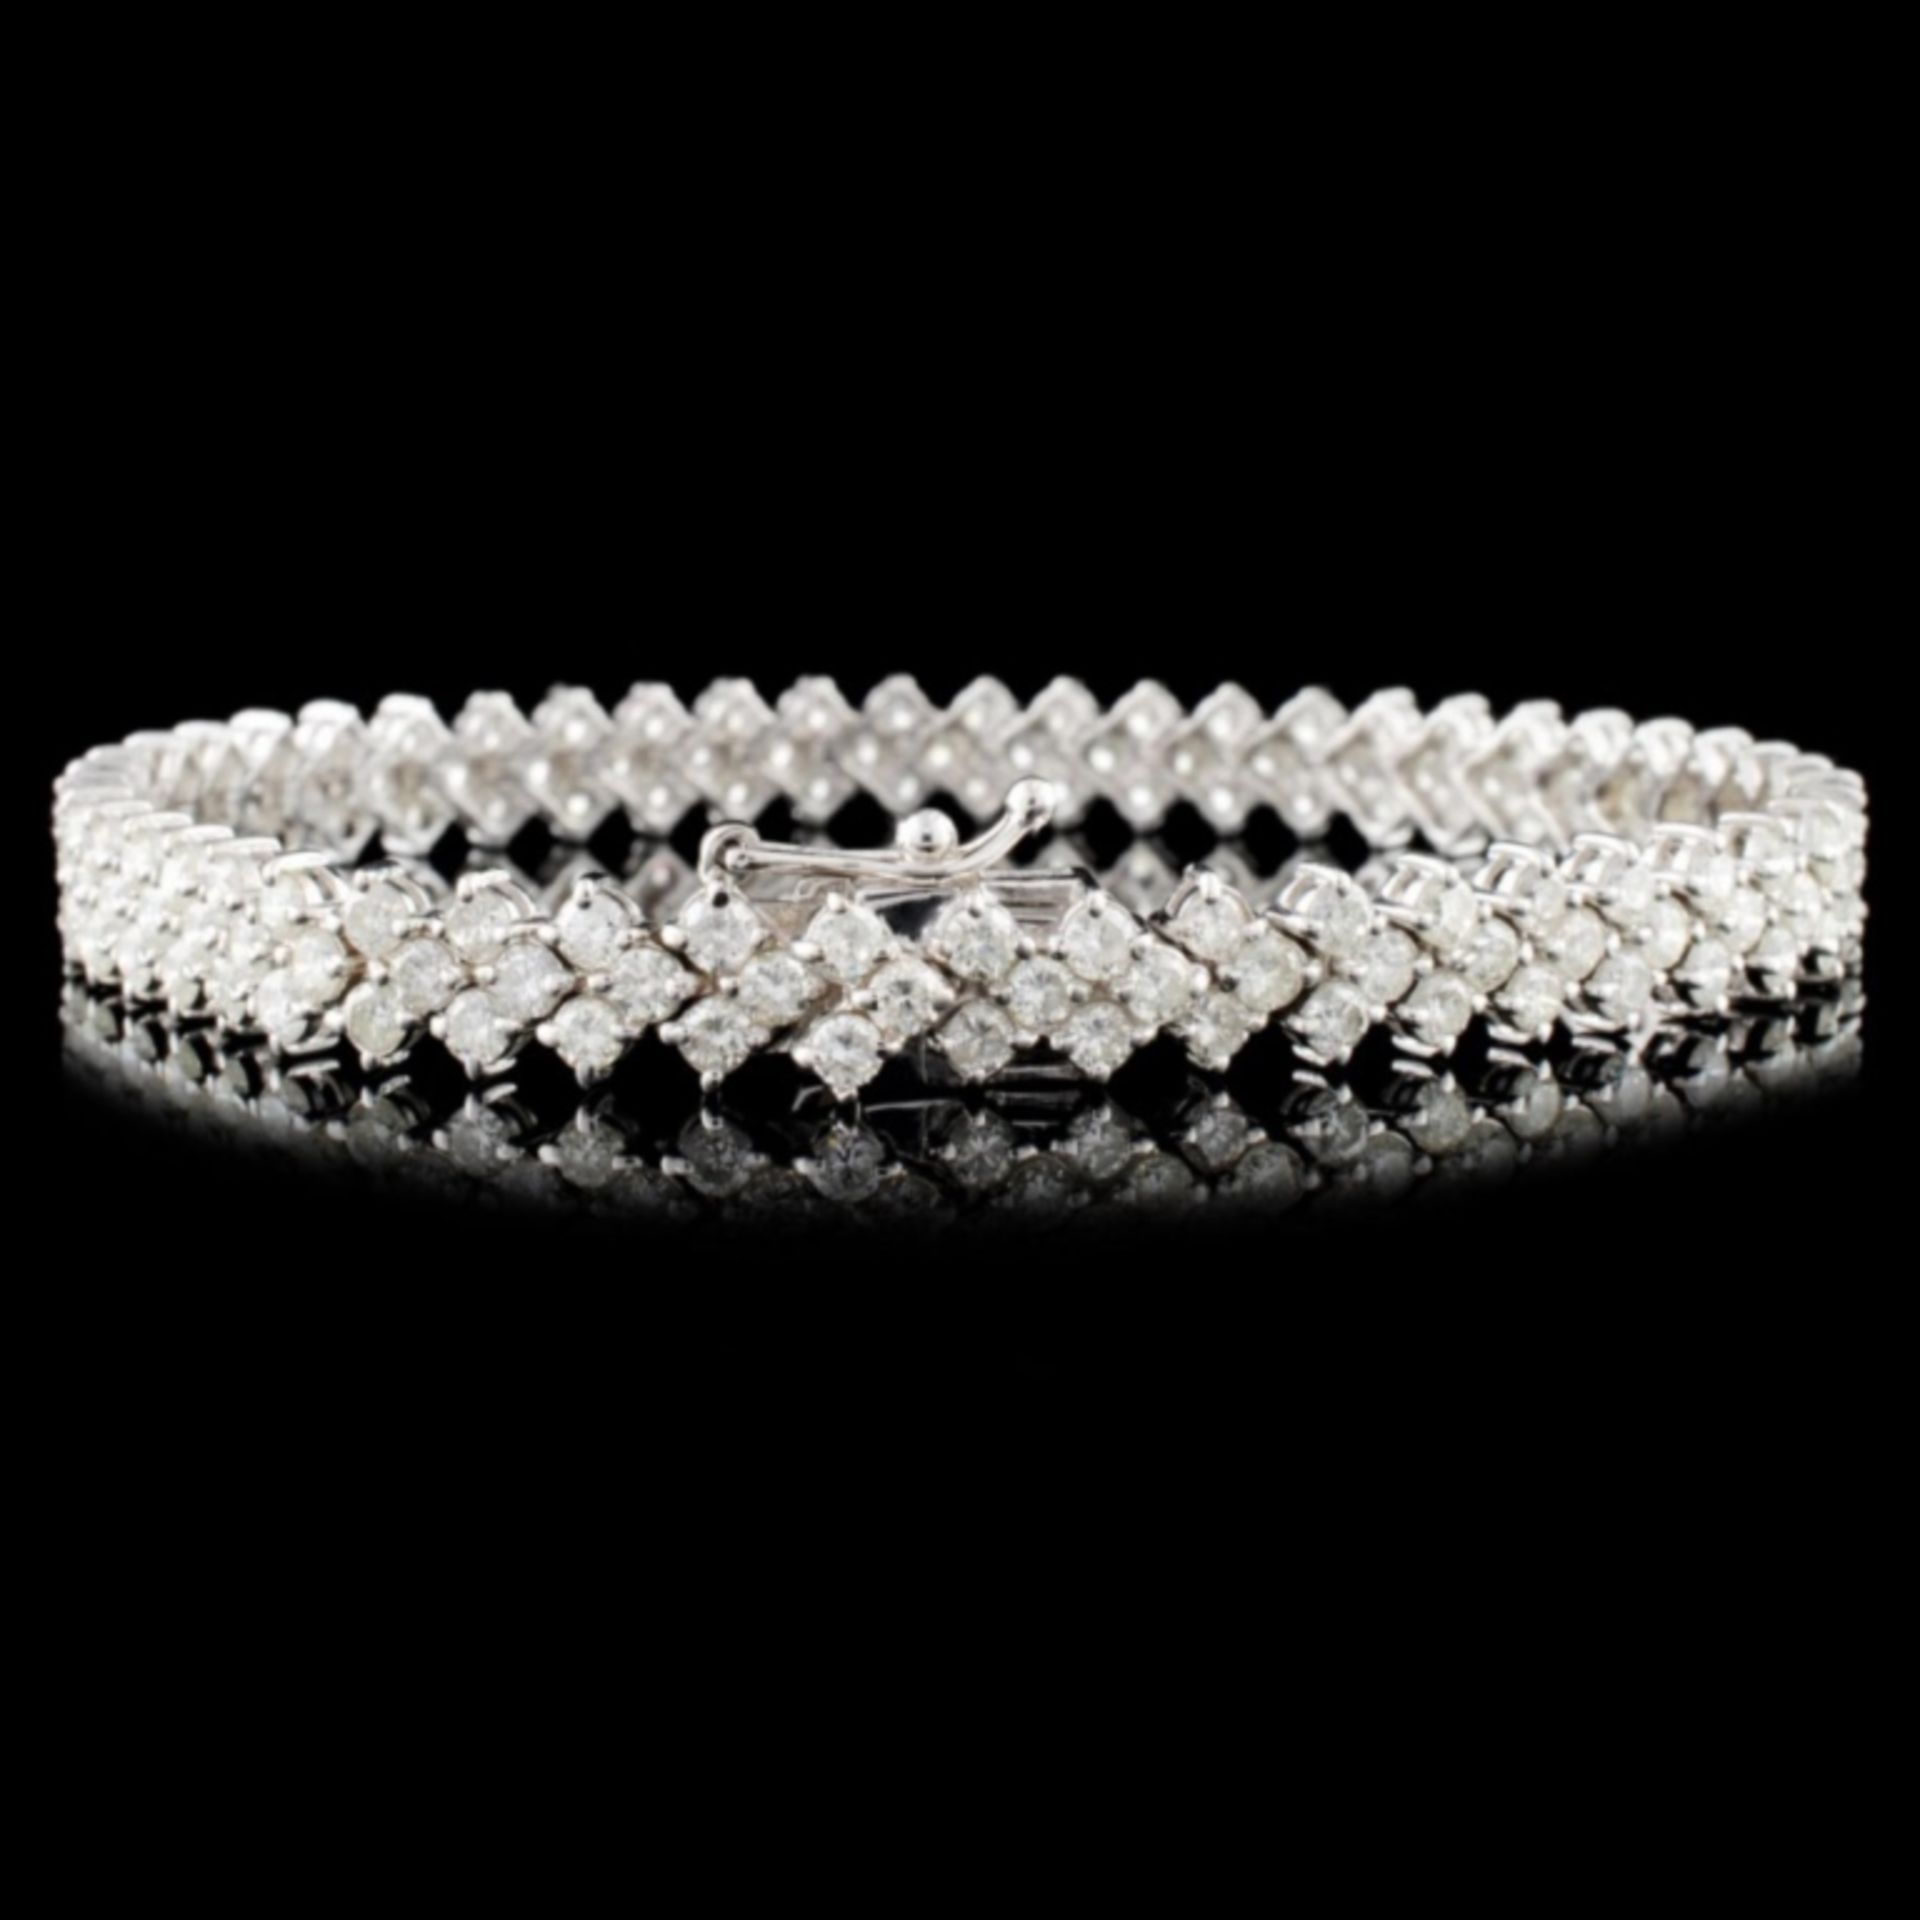 18K Gold 6.00ctw Diamond Bracelet - Image 2 of 3